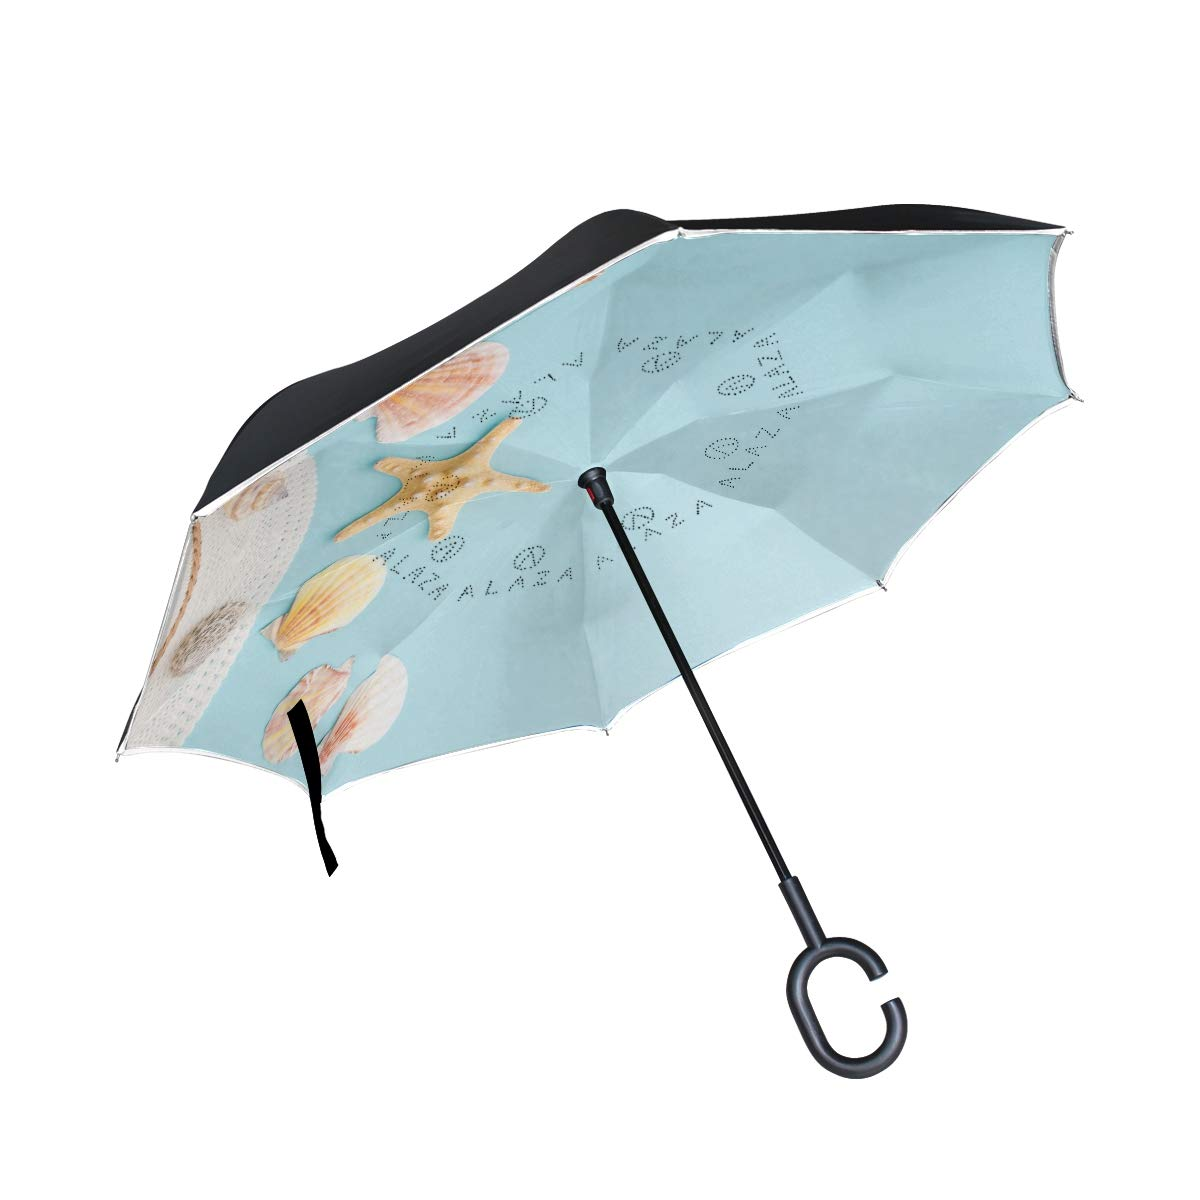 MUMIMI, Parapluie Cannes Mixte Adulte Multicolore Multicolore Taille Unique